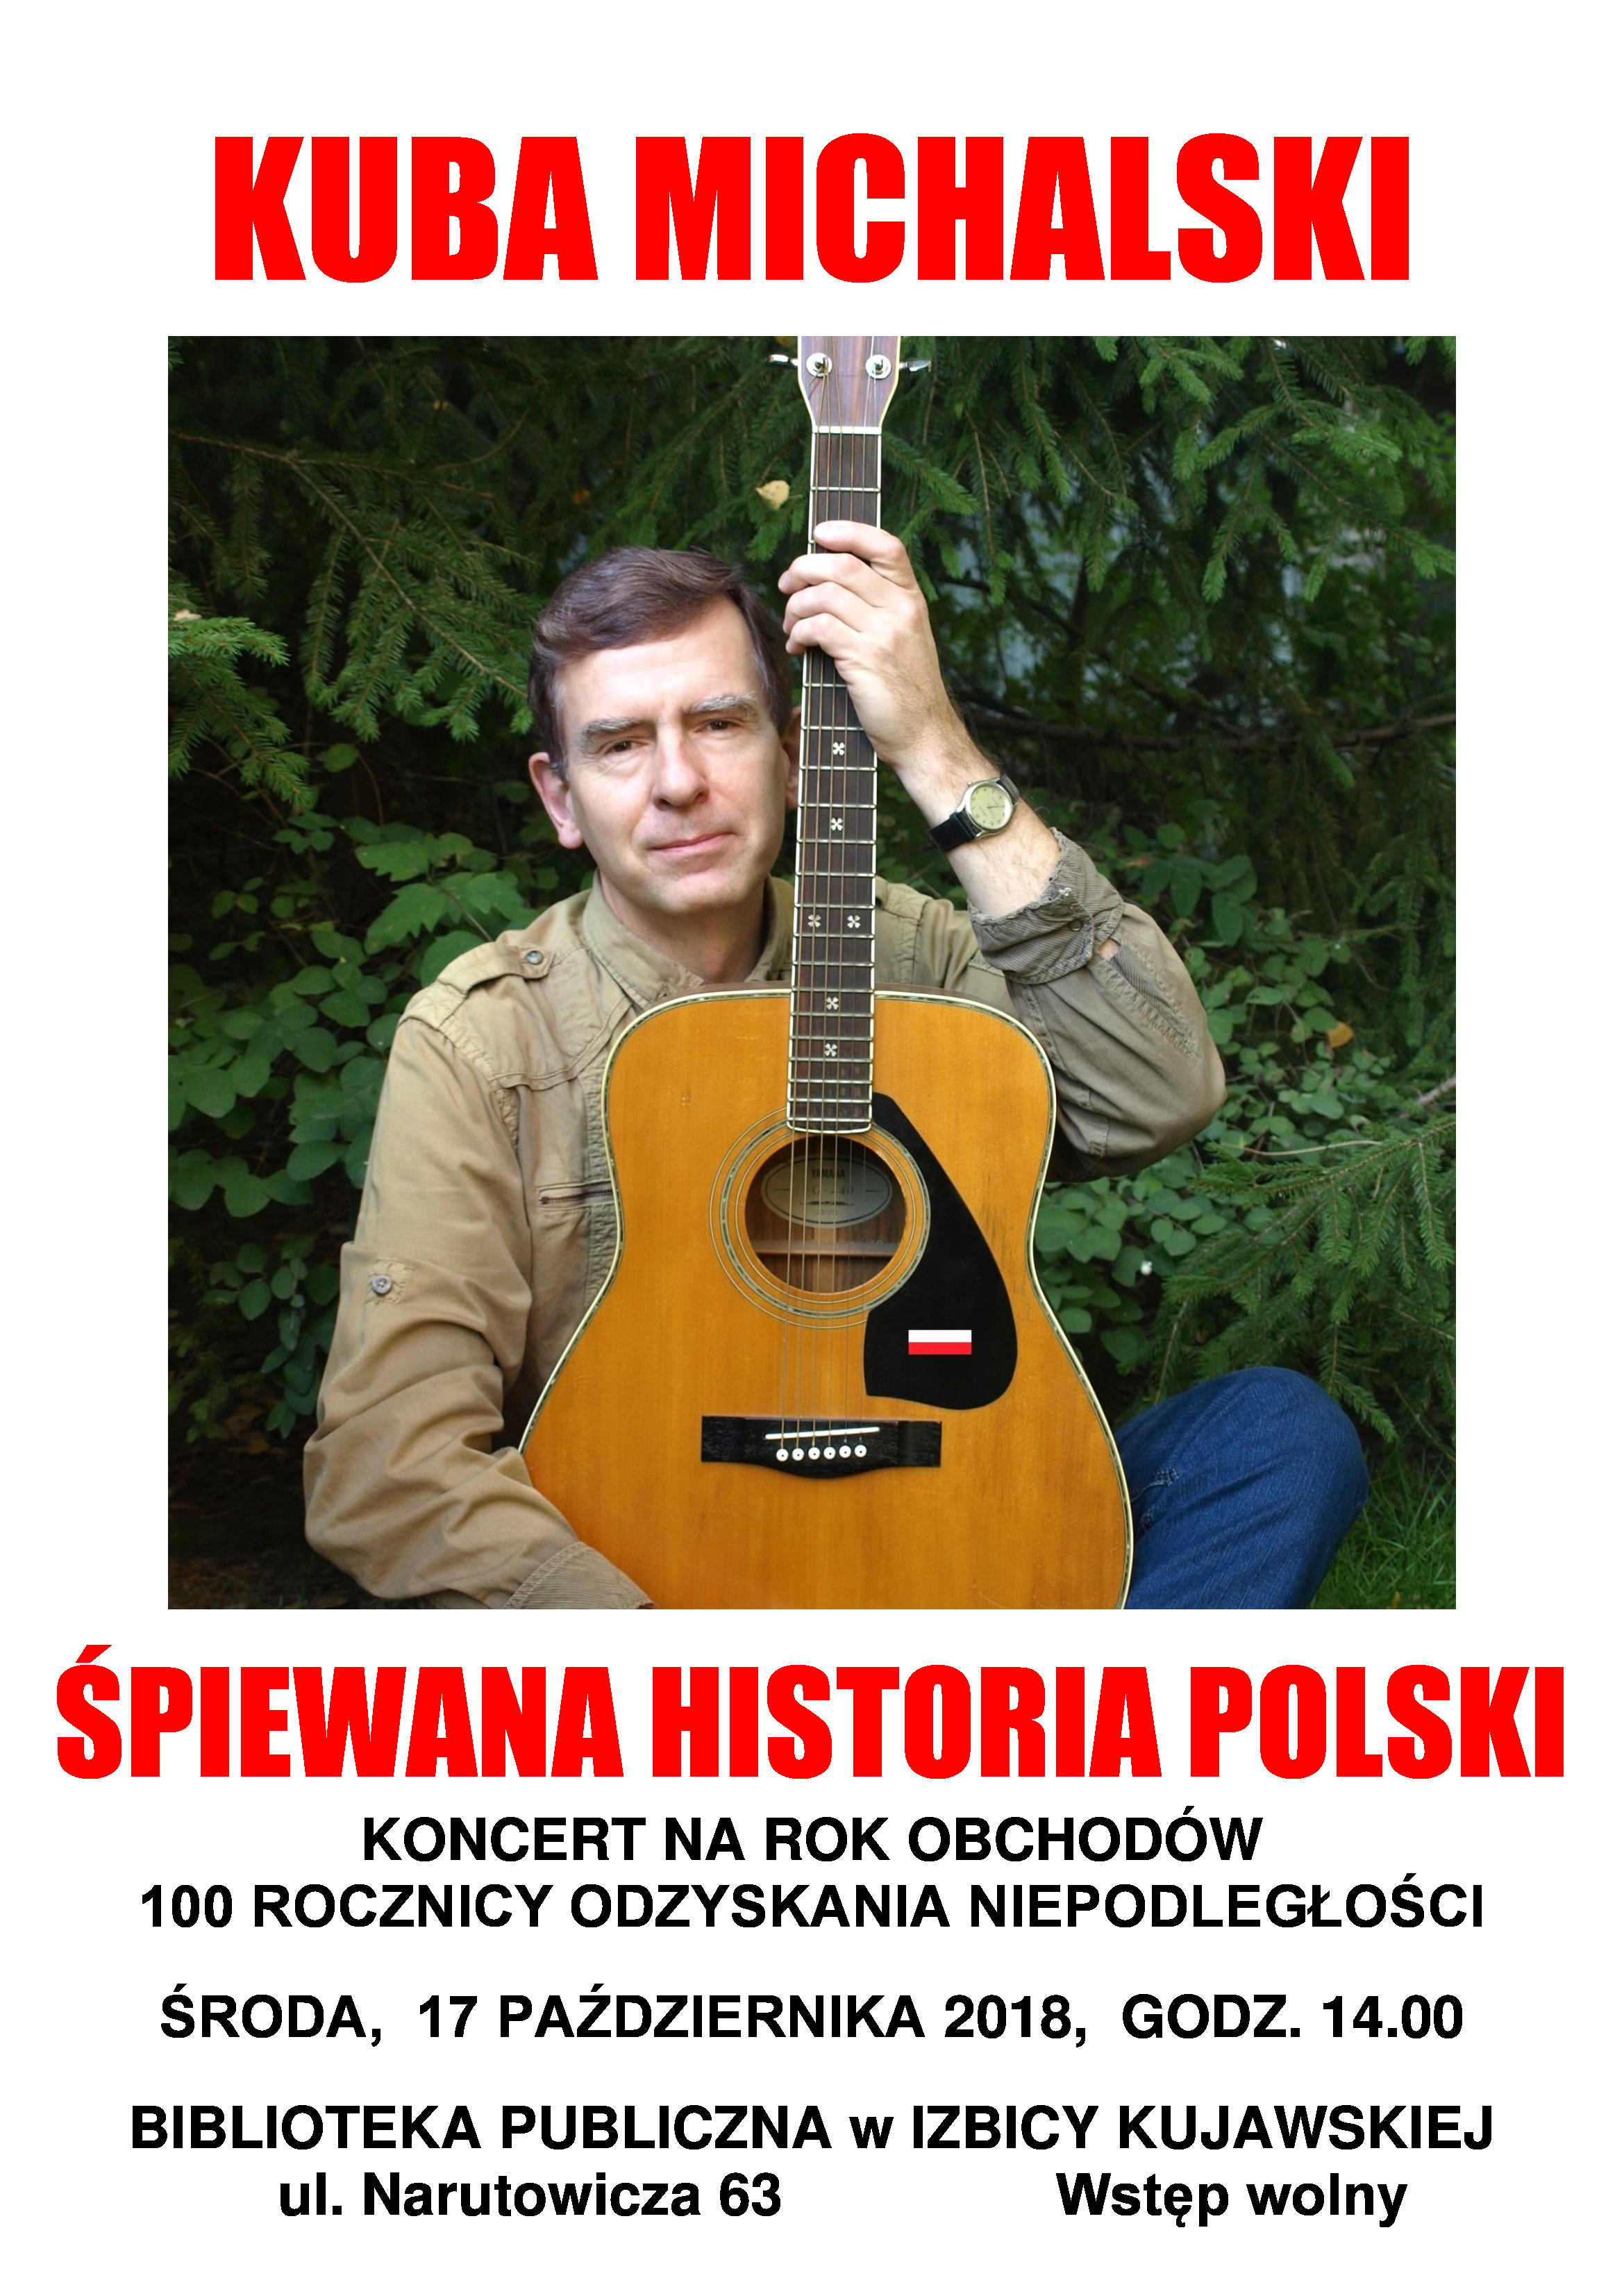 Plakat-A3-KUBA-MICHALSKI-Izbica-Kujawska